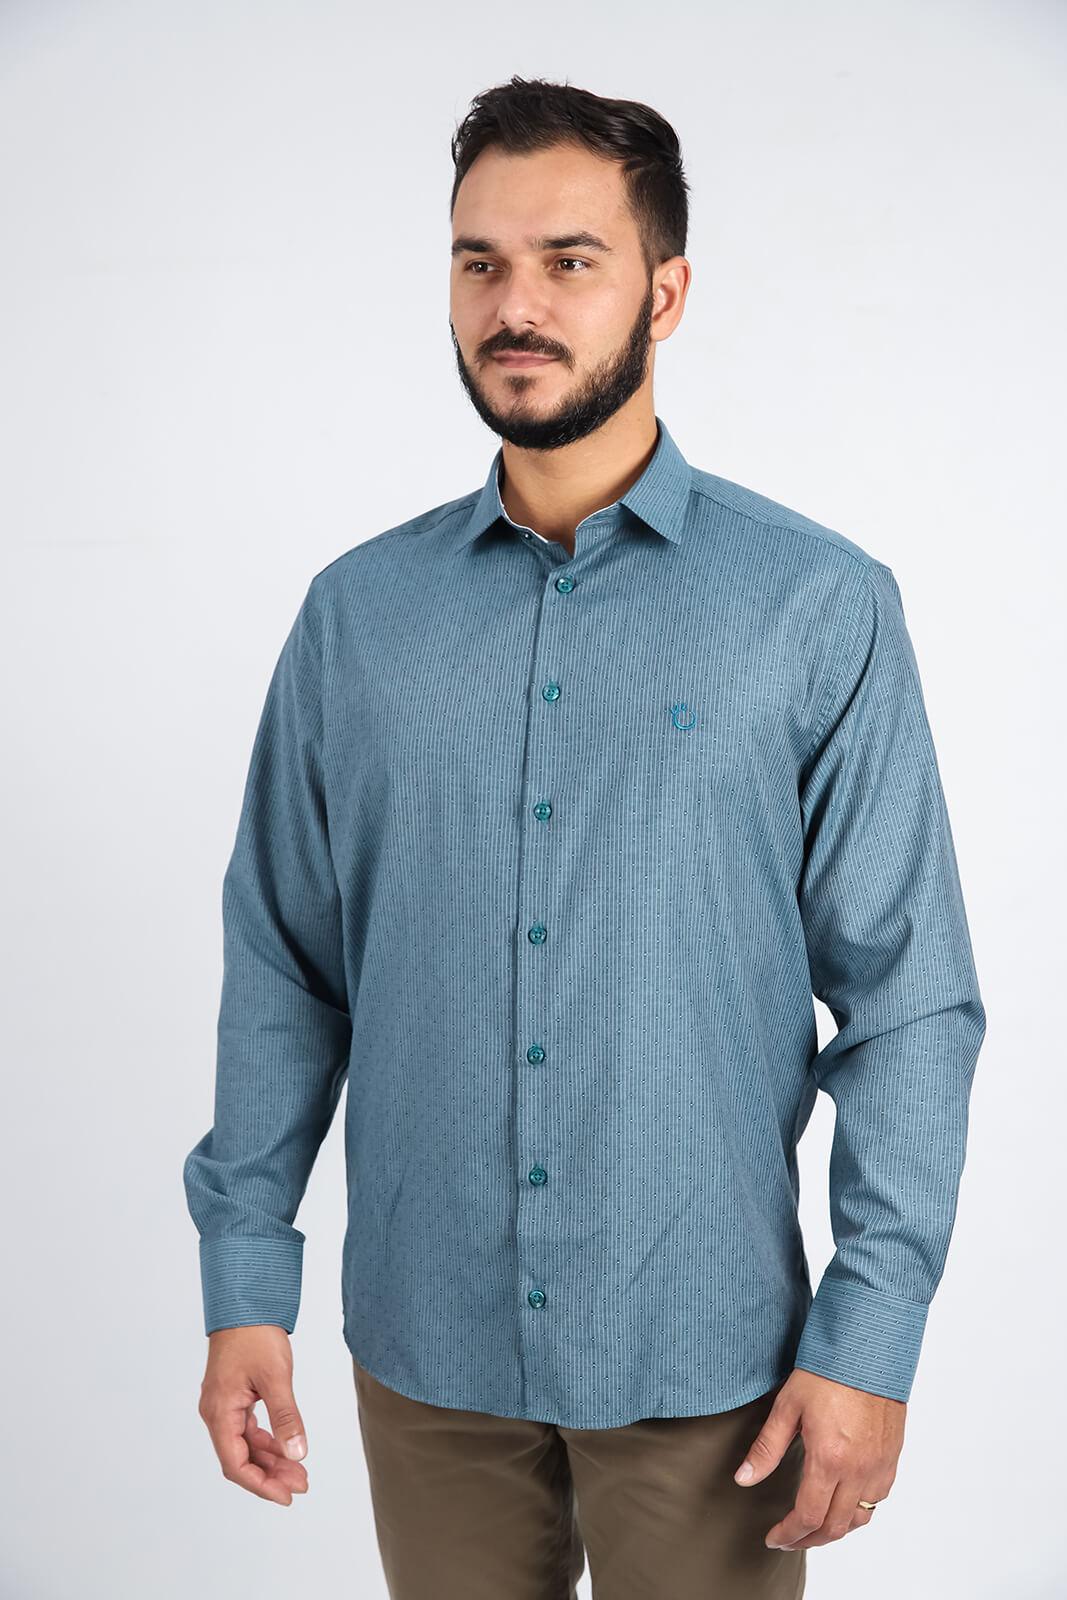 Camisa Social Masculina Slim Olimpo Listrada Maquinetada Manga Longa